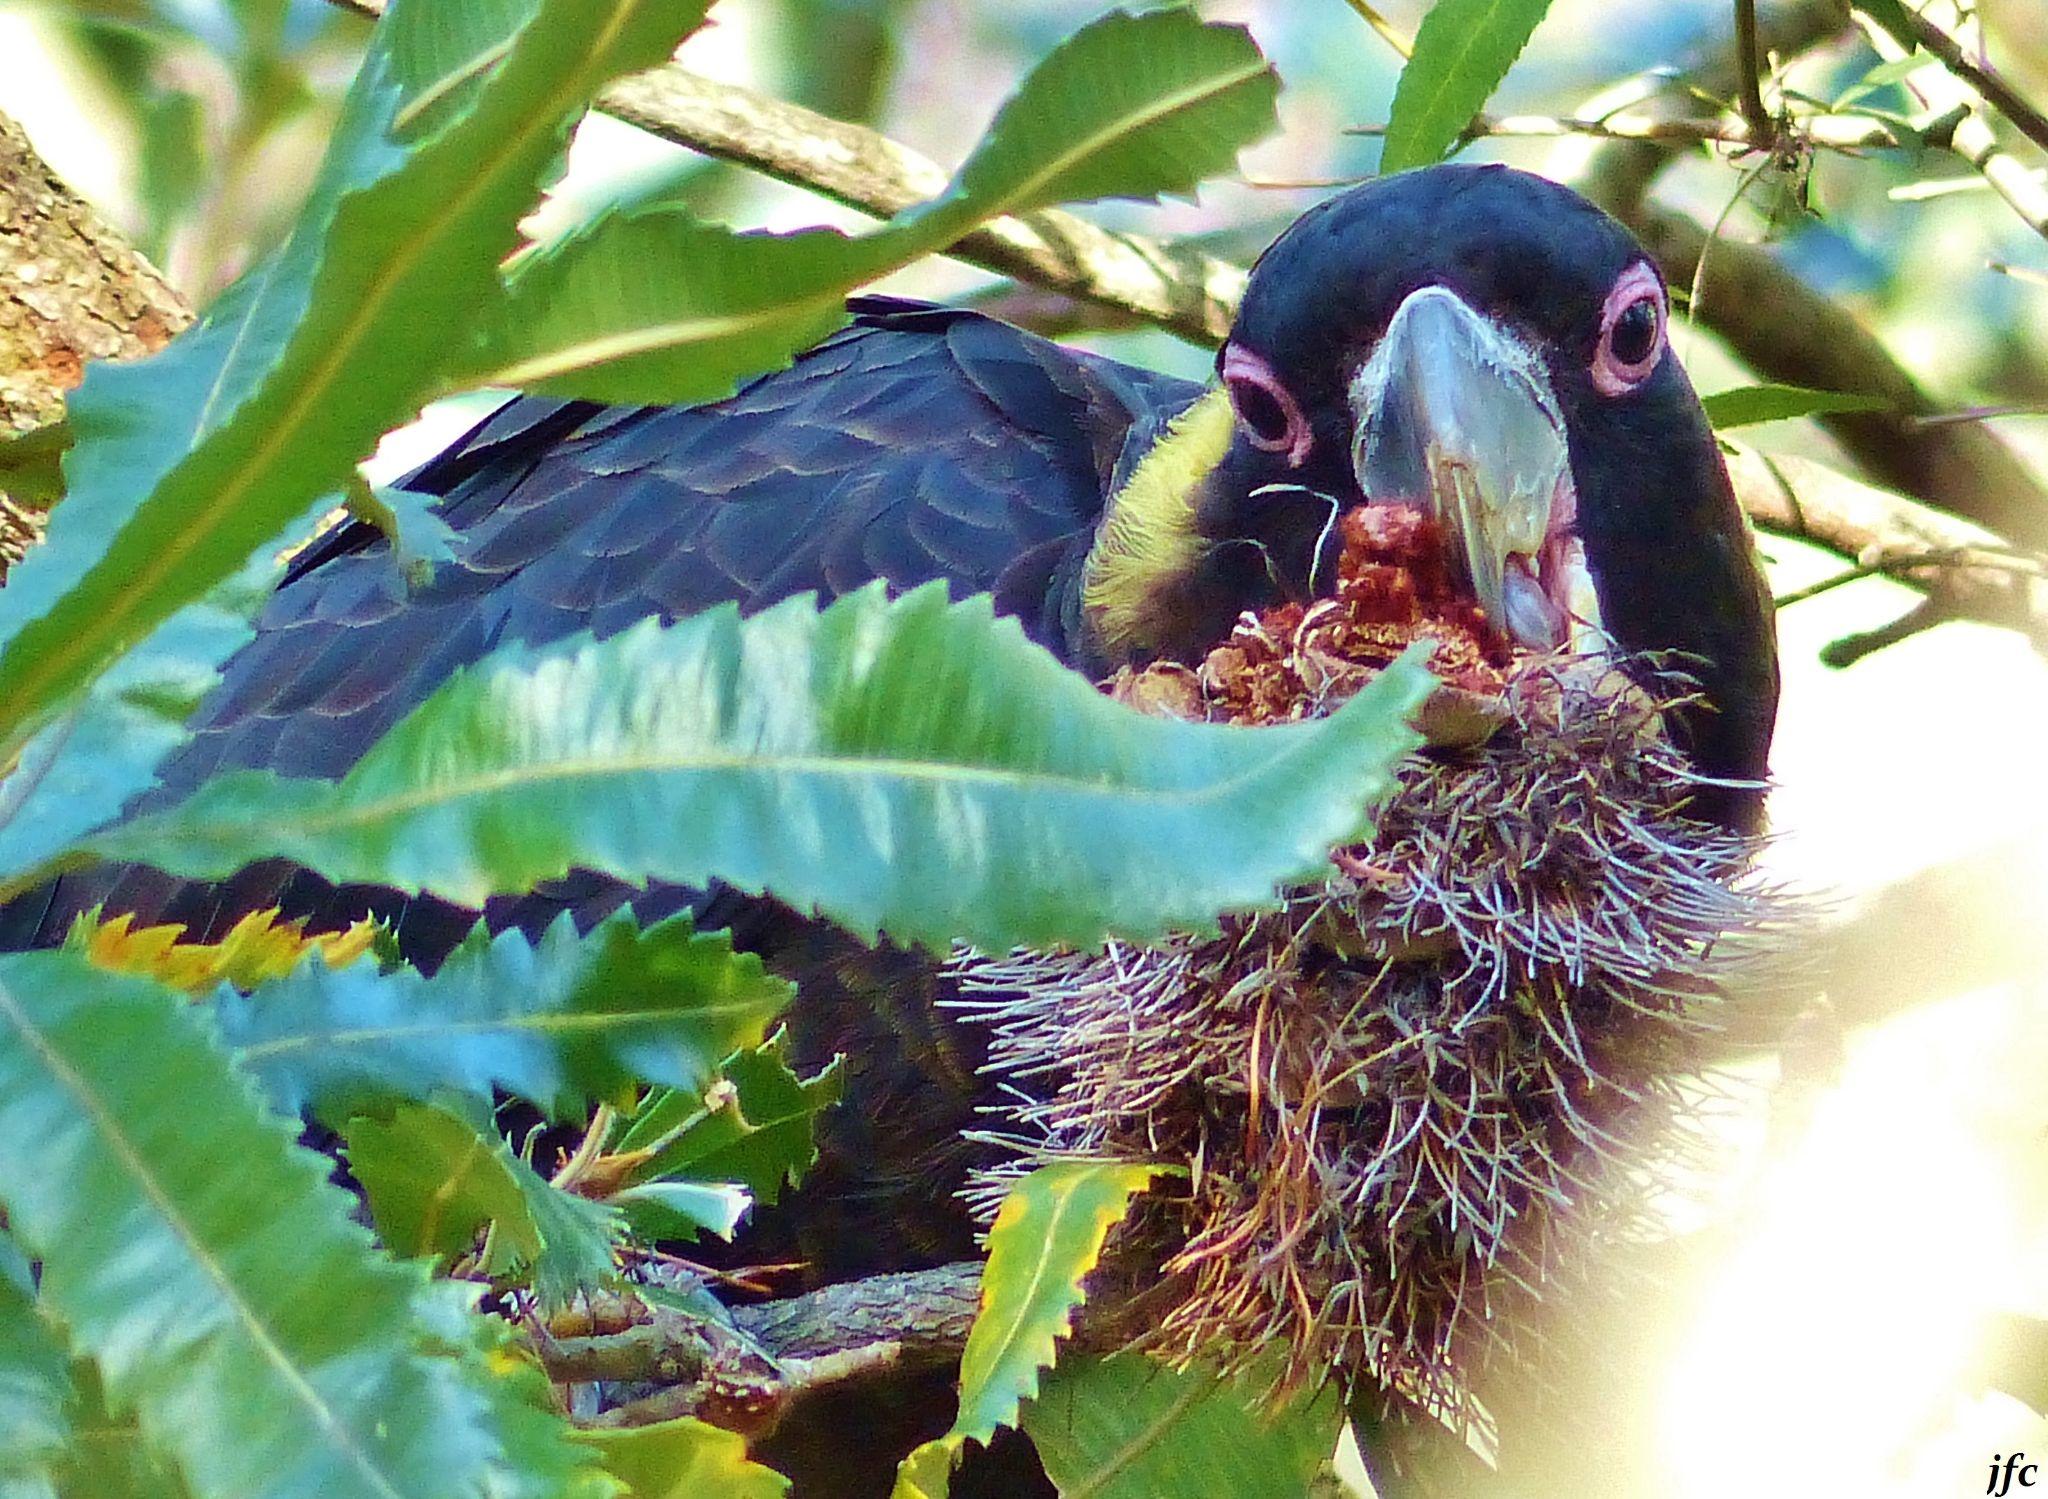 Black cokatoo by johnfalconcostanzo